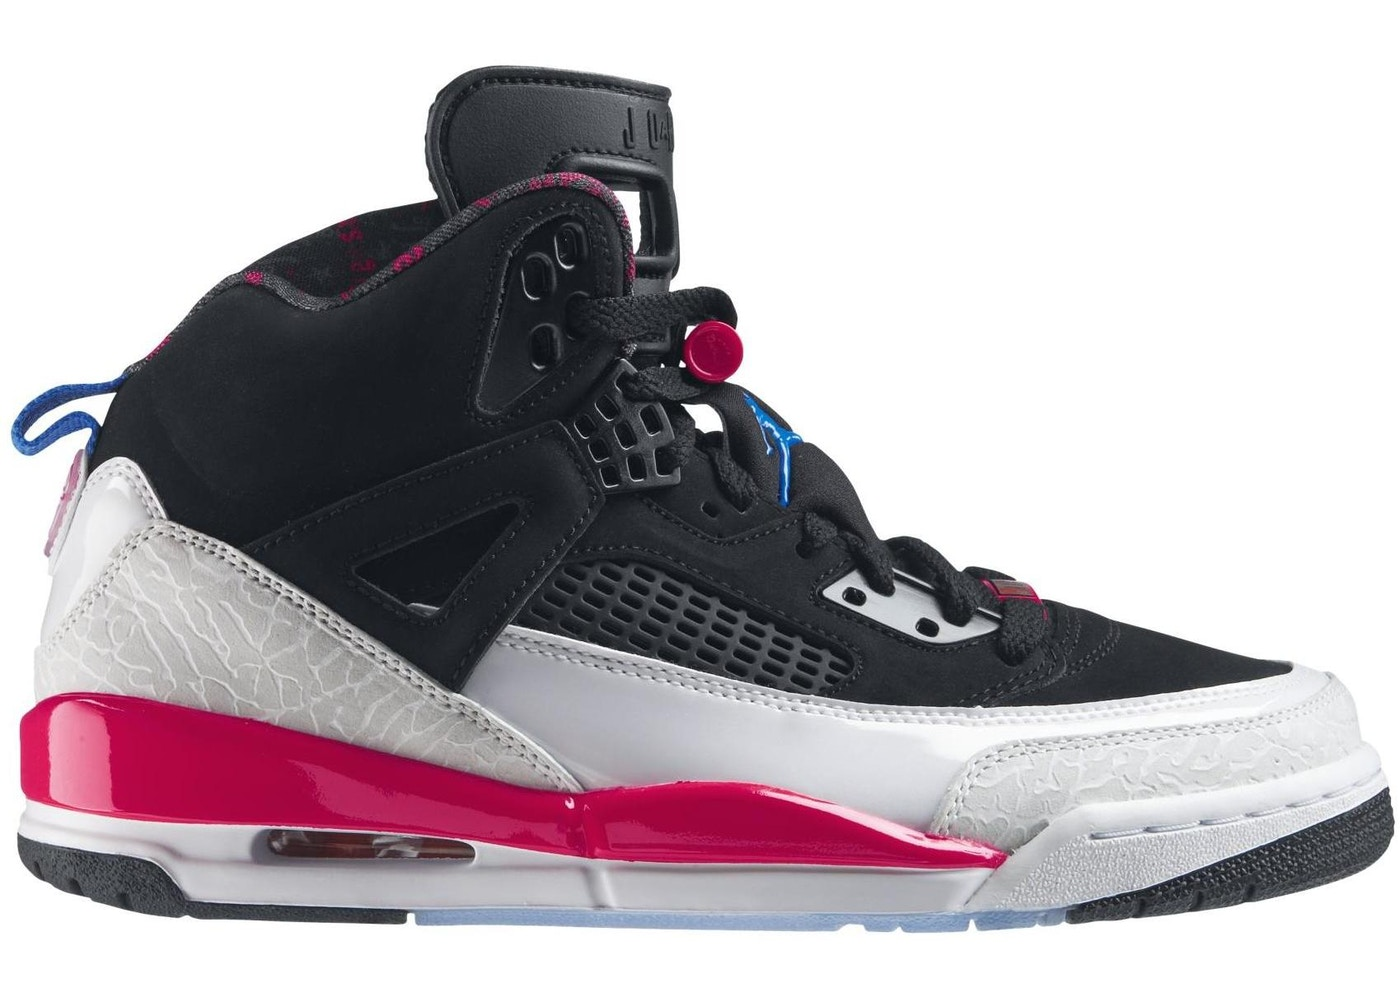 reputable site e1fd5 98620 Jordan Spiz ike Infrared